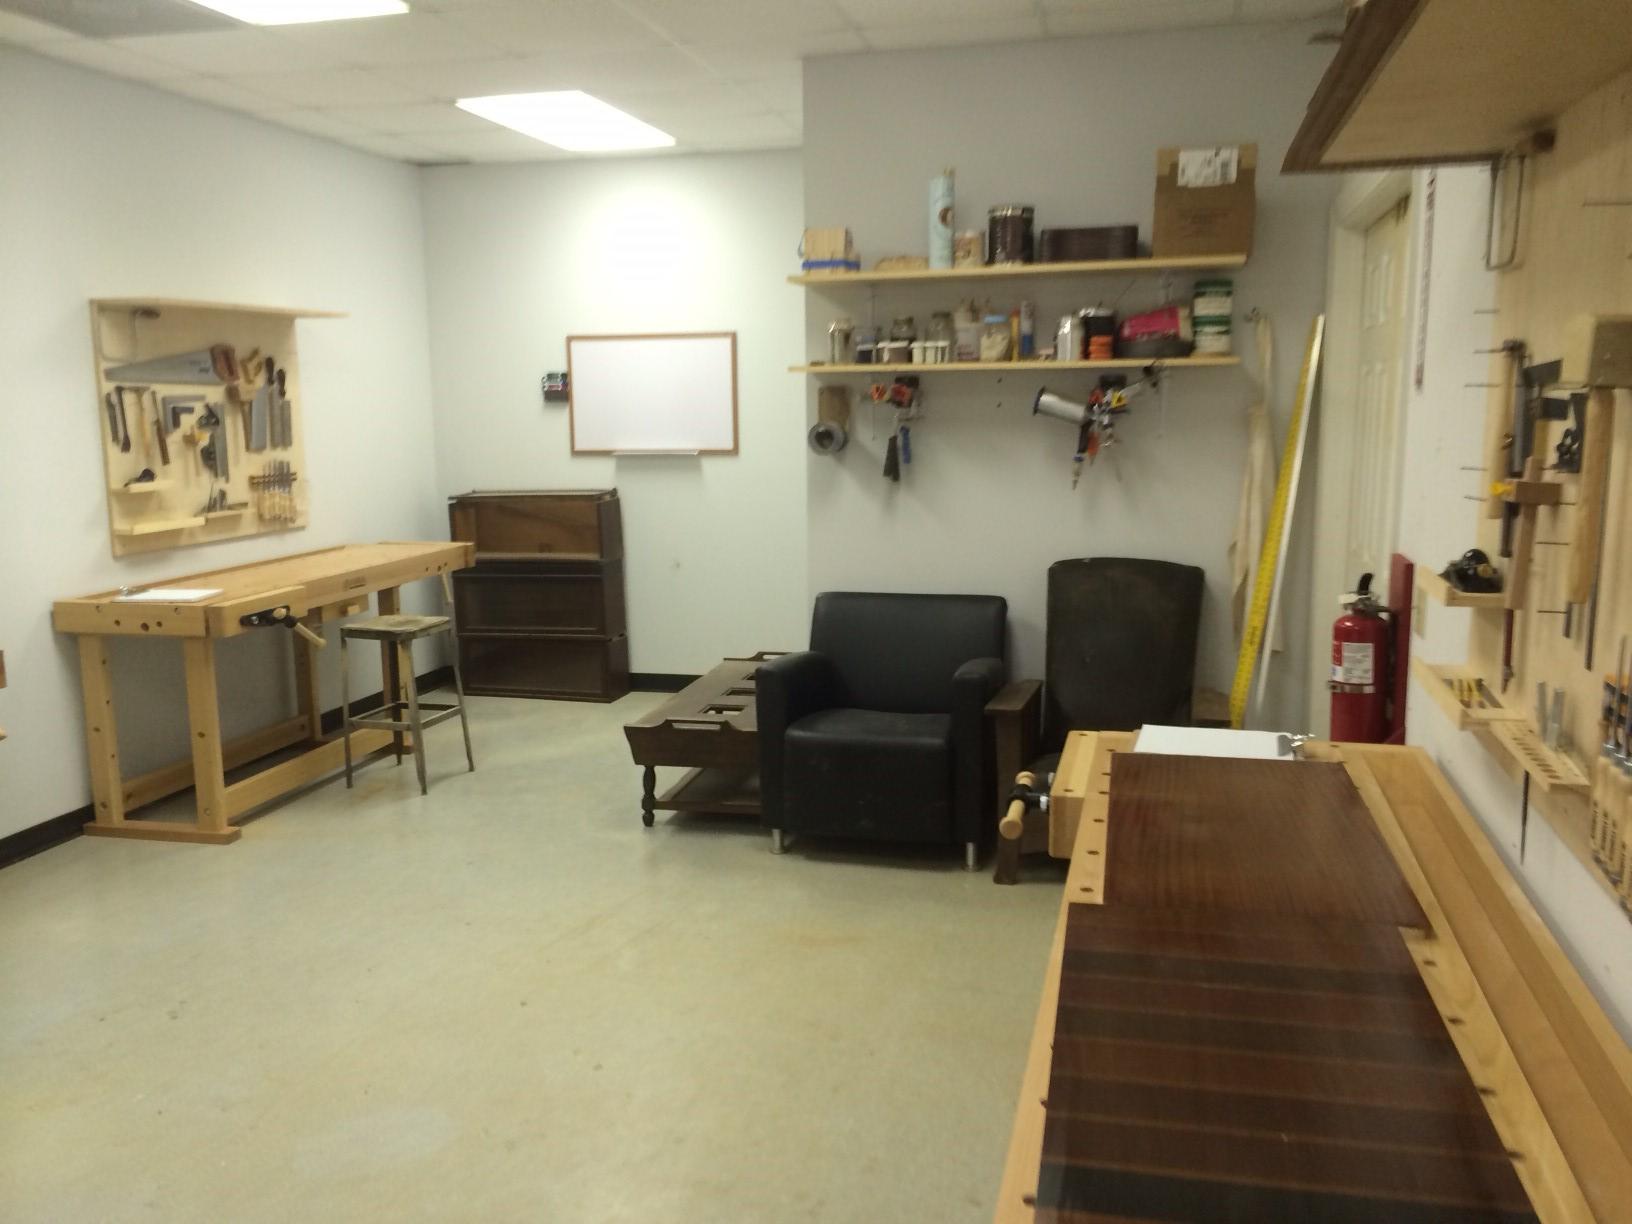 Charleston Woodworking School In The Studio